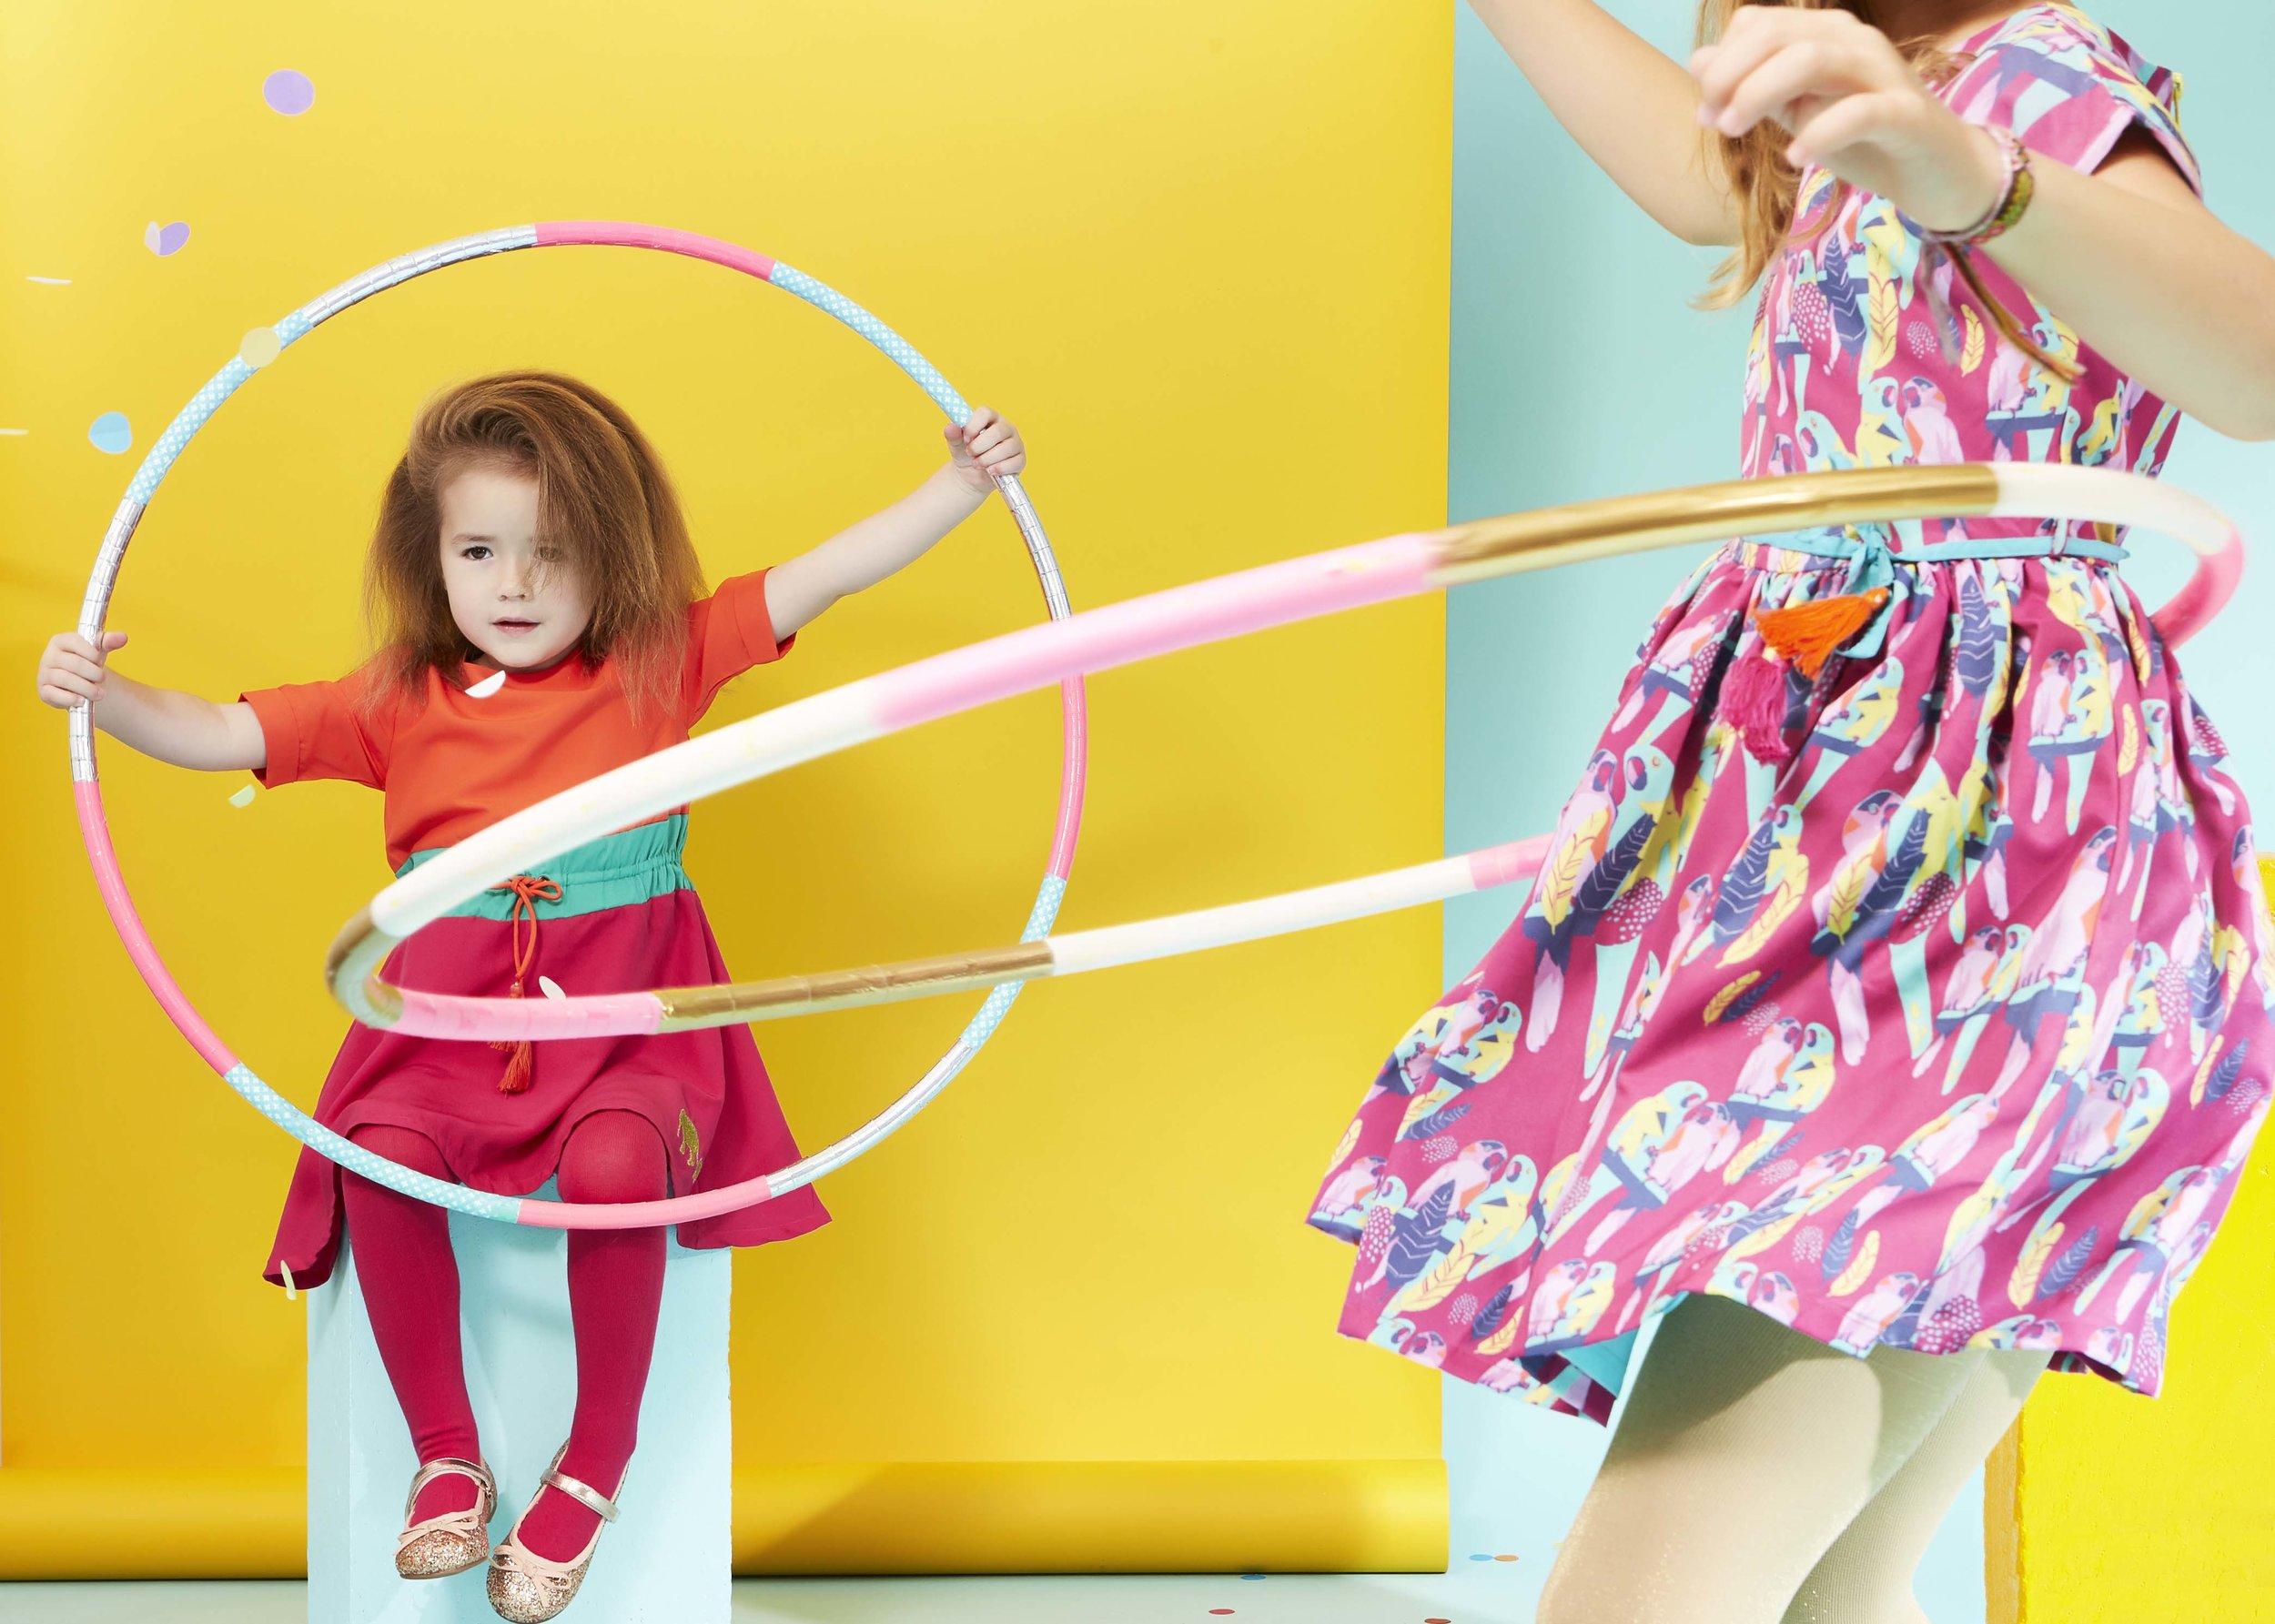 Liz_Cooper_Interior_Stylist_Styling_Kids_Fashion_Yellow_Colourblock_Parrots_Orange_dress.jpg